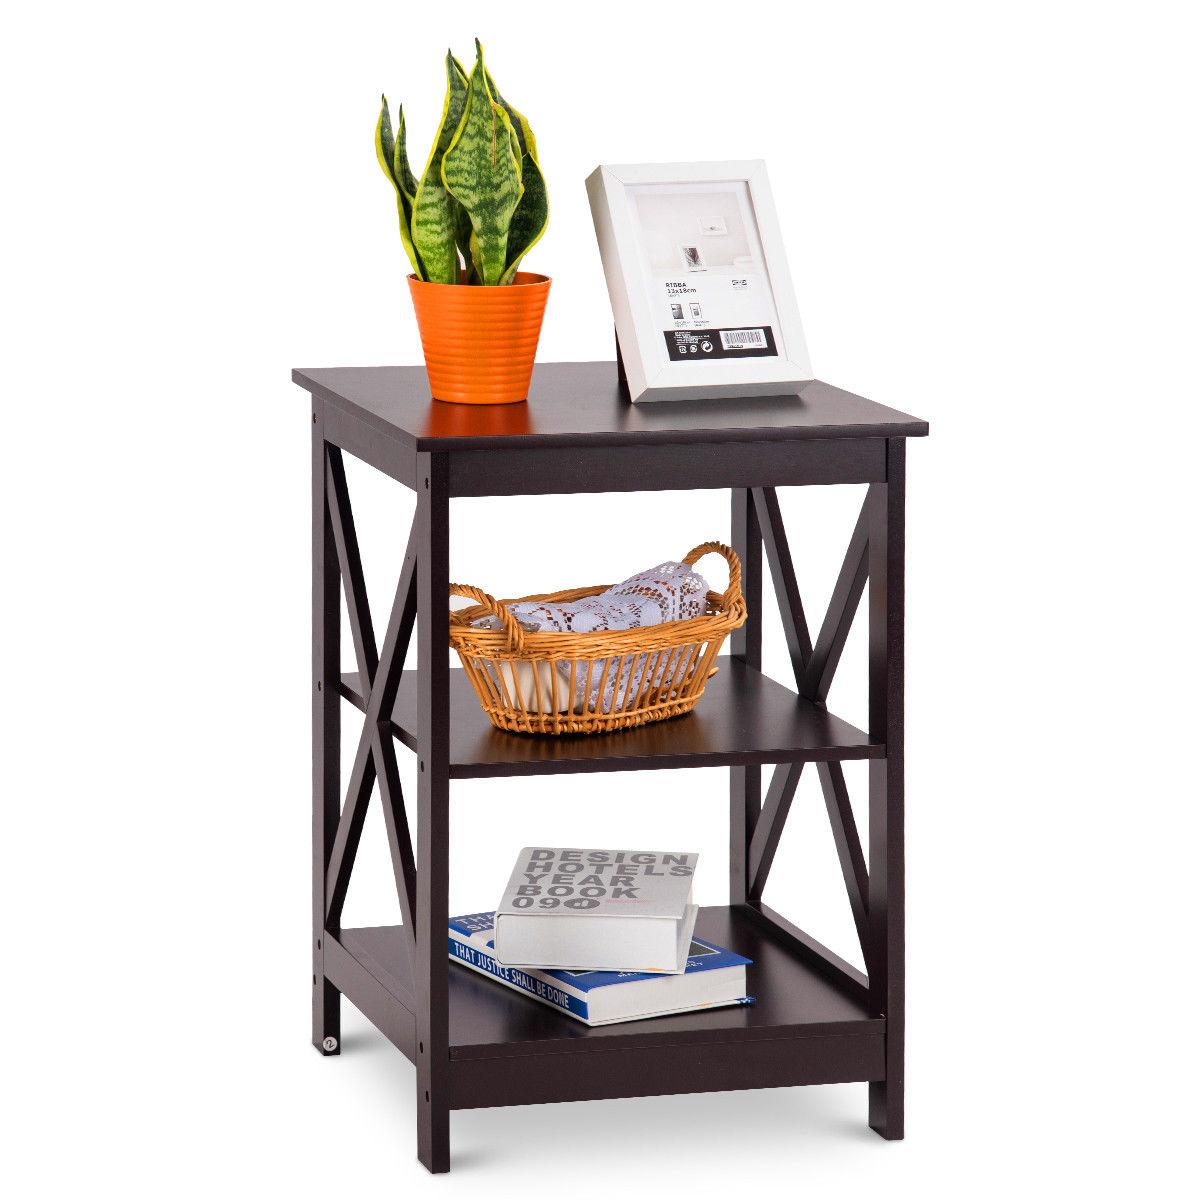 Costway Costway 3 Tier Nightstand End Table Storage Display Shelf